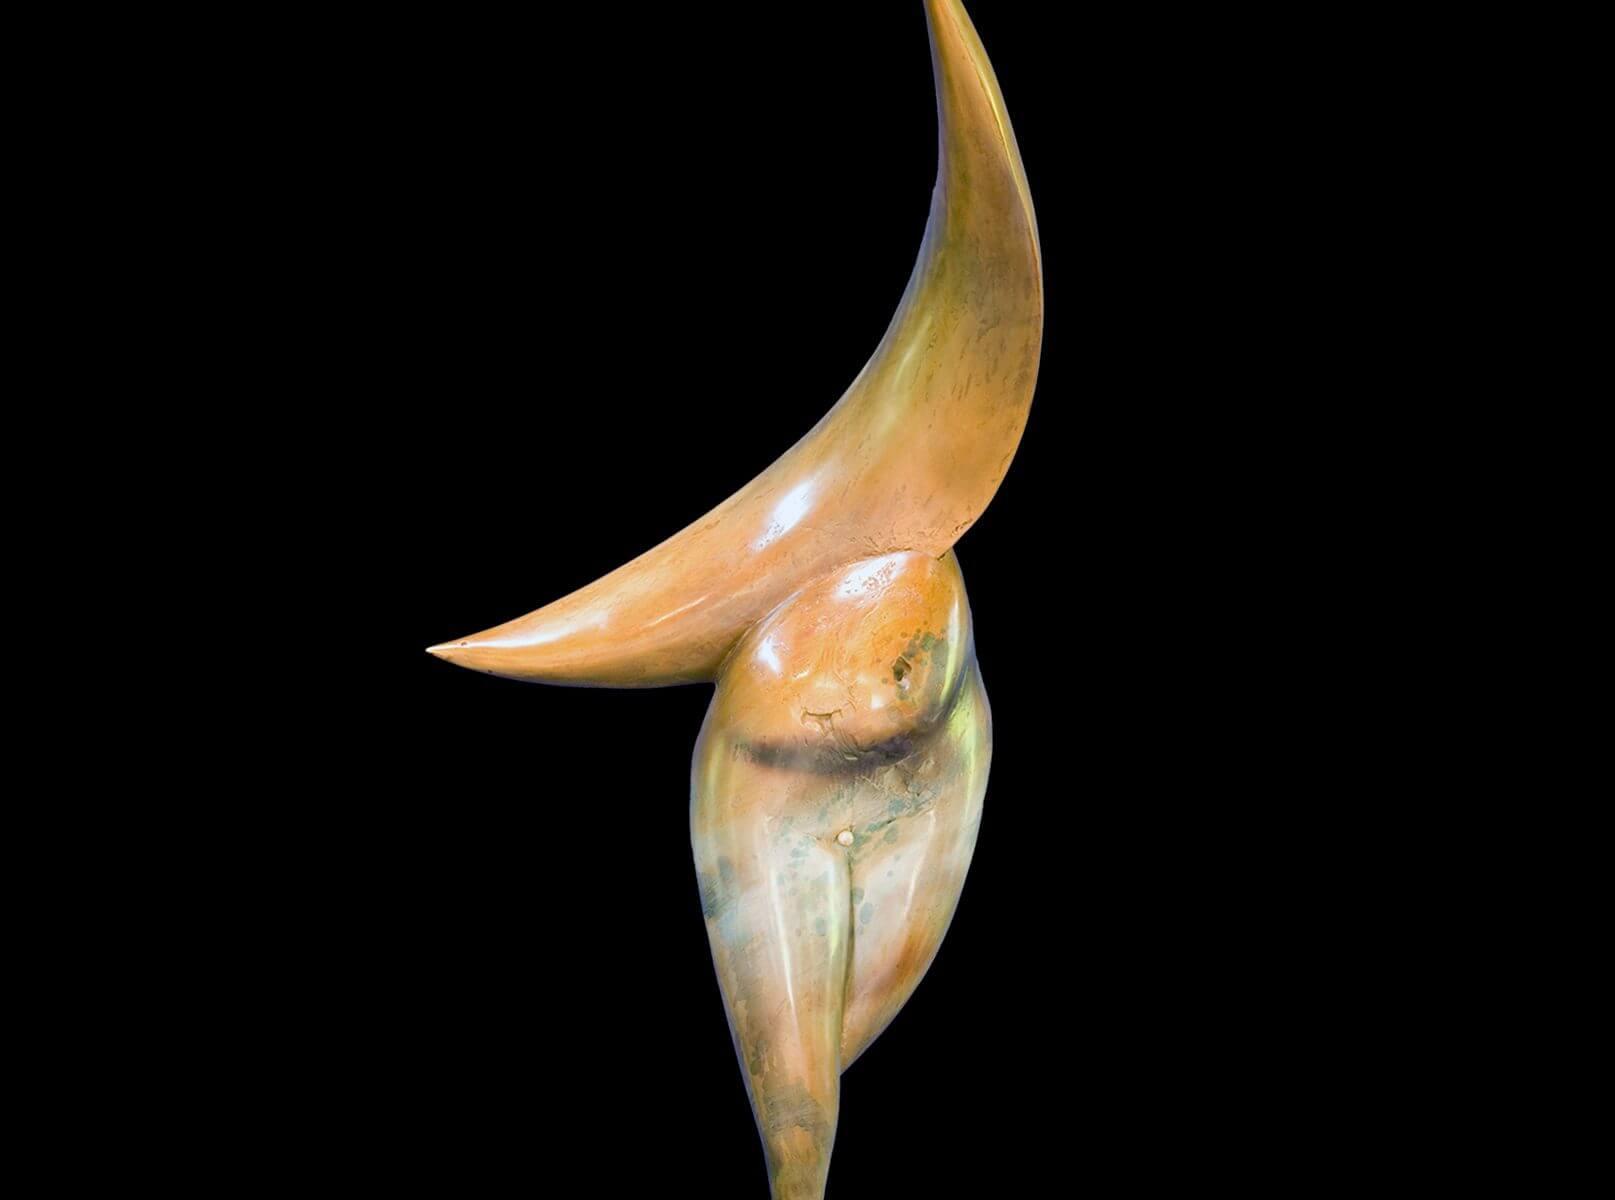 Venus et Luna a figurative abstract bronze sculpture by Andrew DeVries